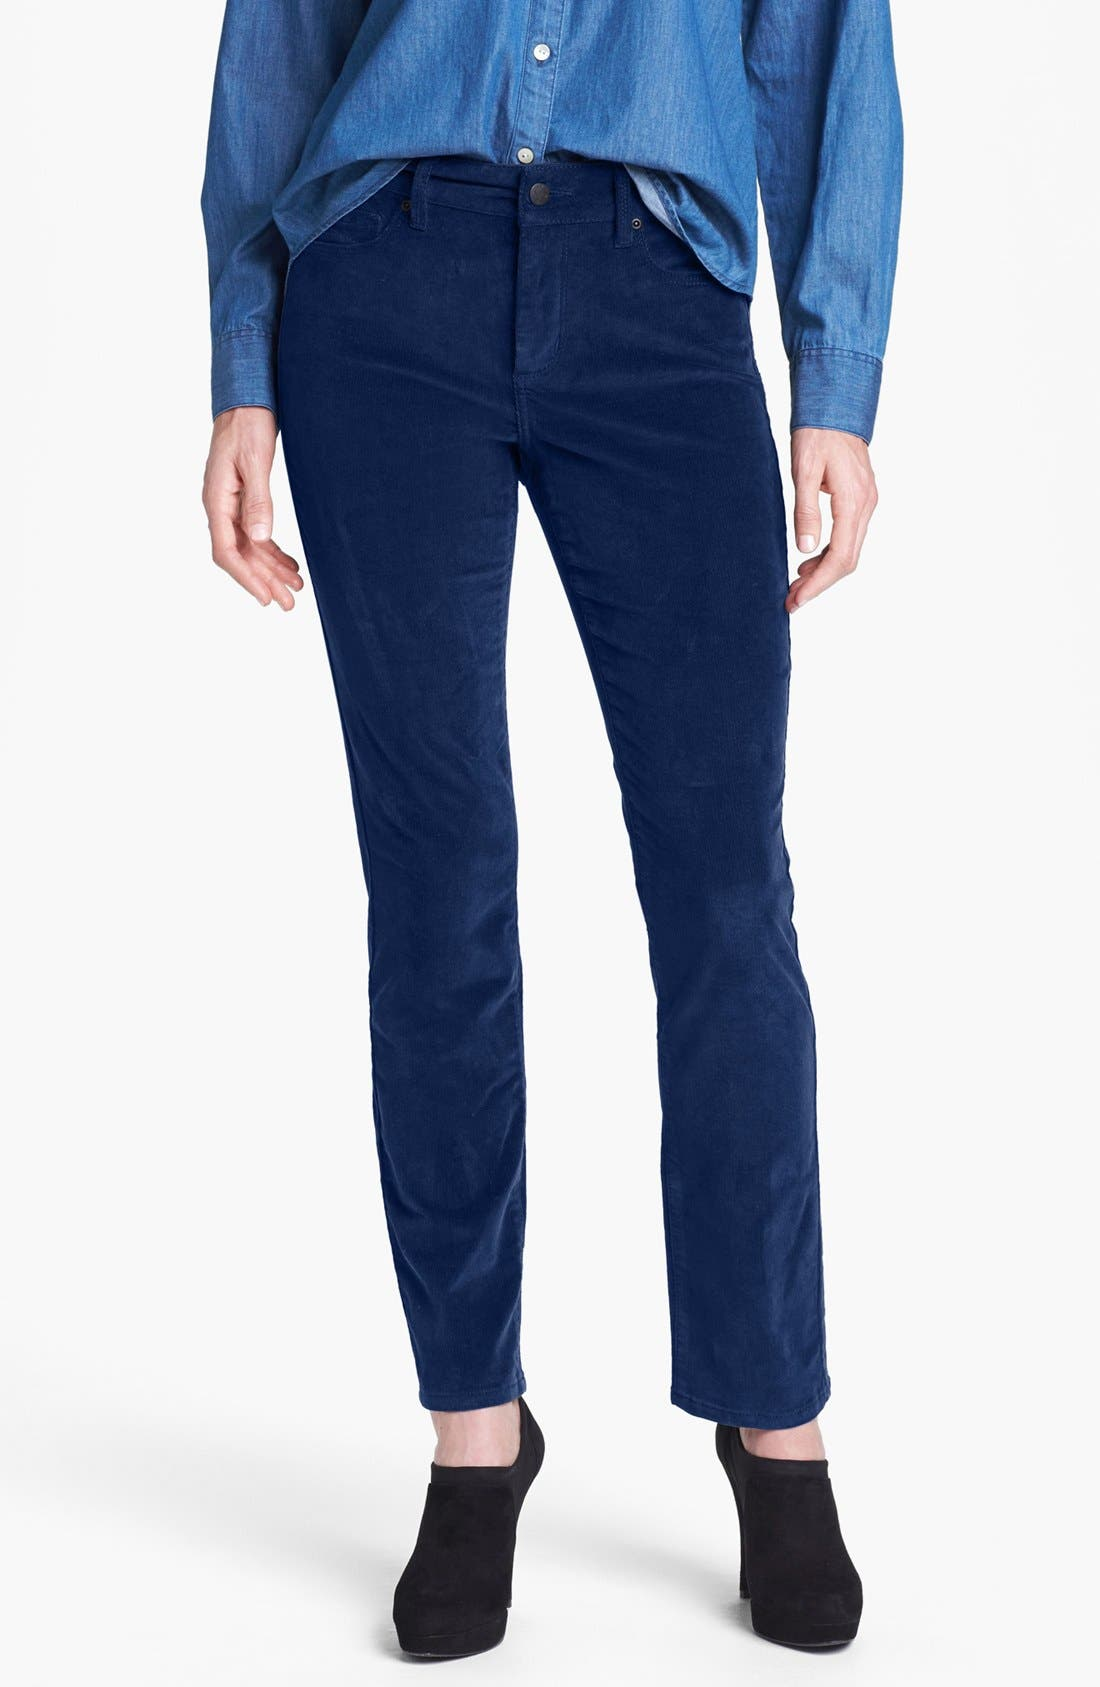 Main Image - NYDJ 'Sheri' Colored Stretch Corduroy Skinny Pants (Regular & Petite)